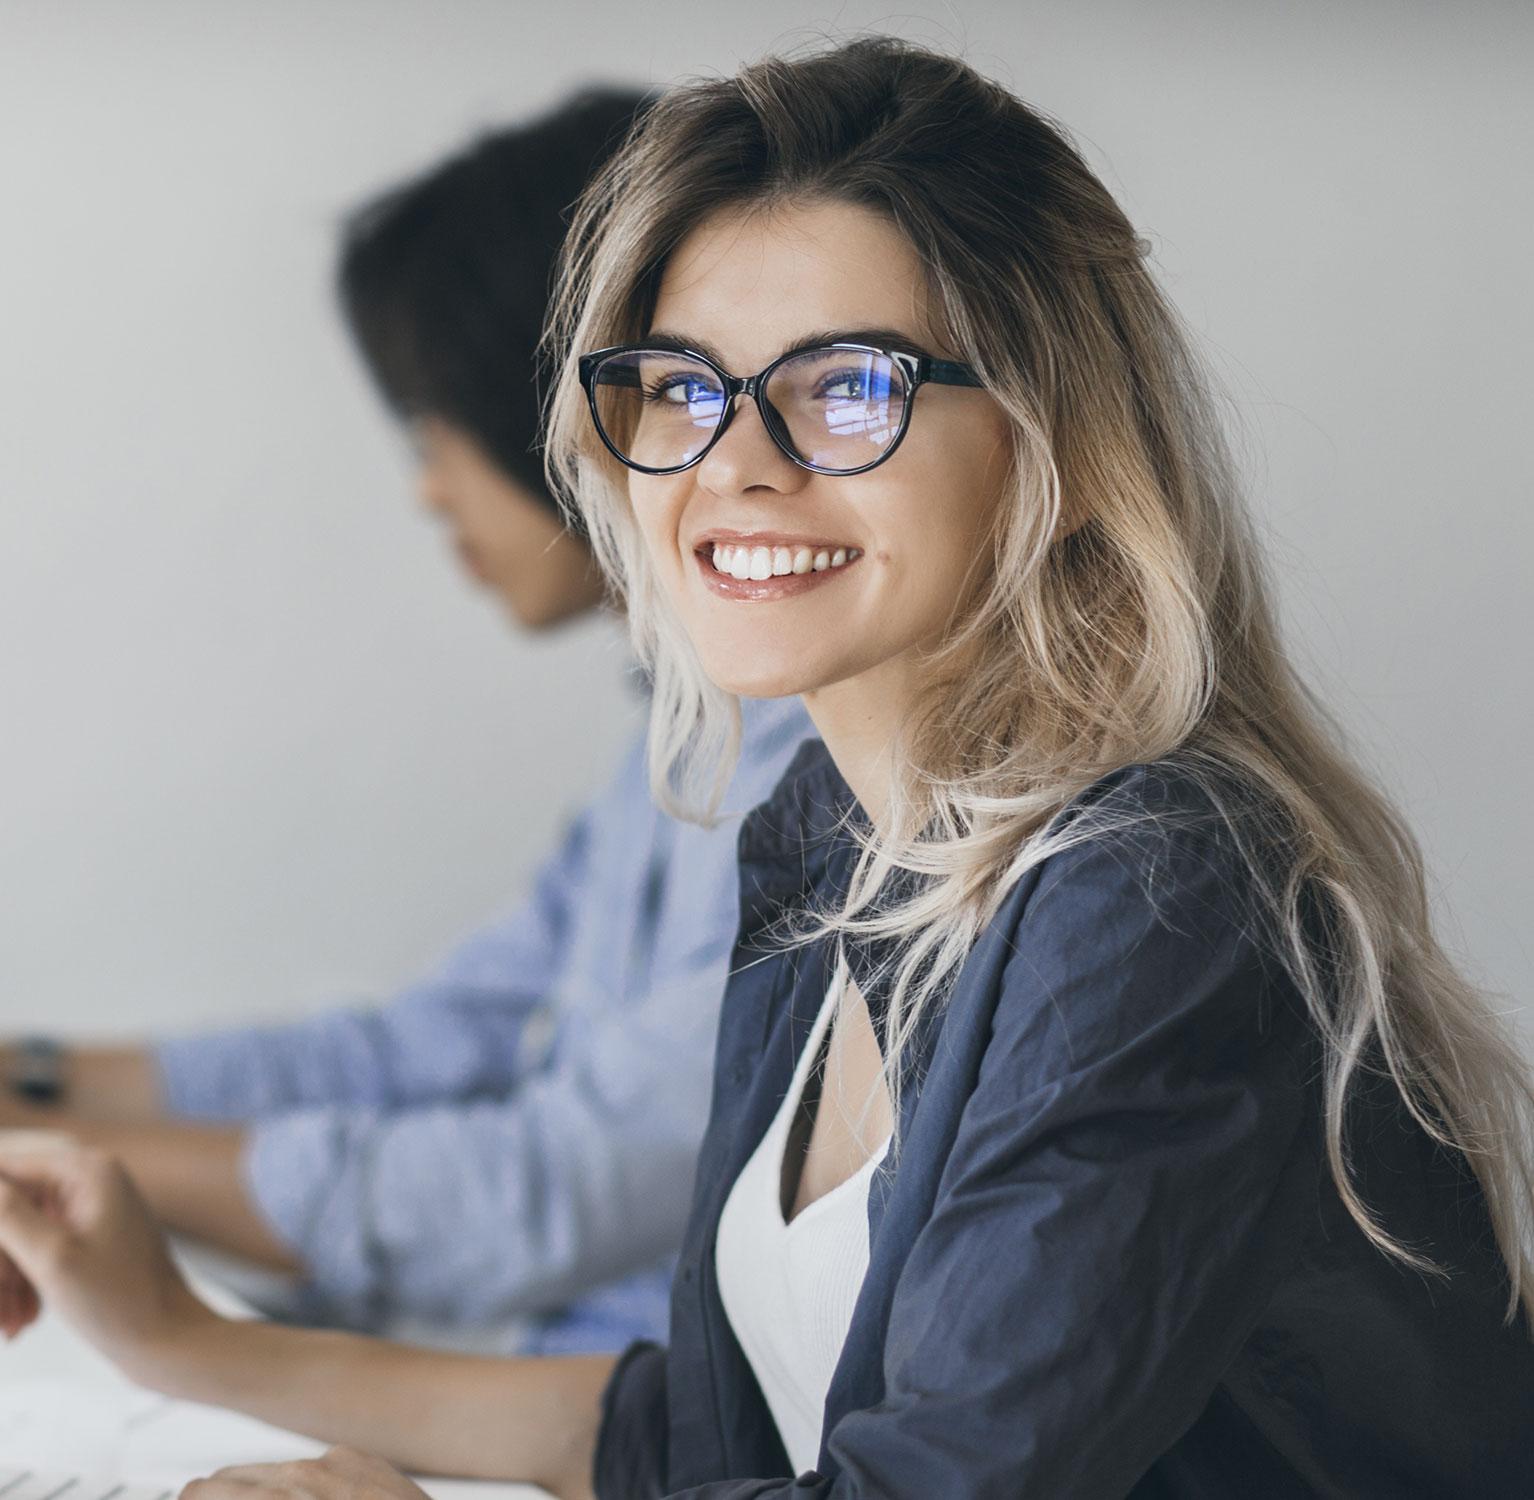 Female professional smiling